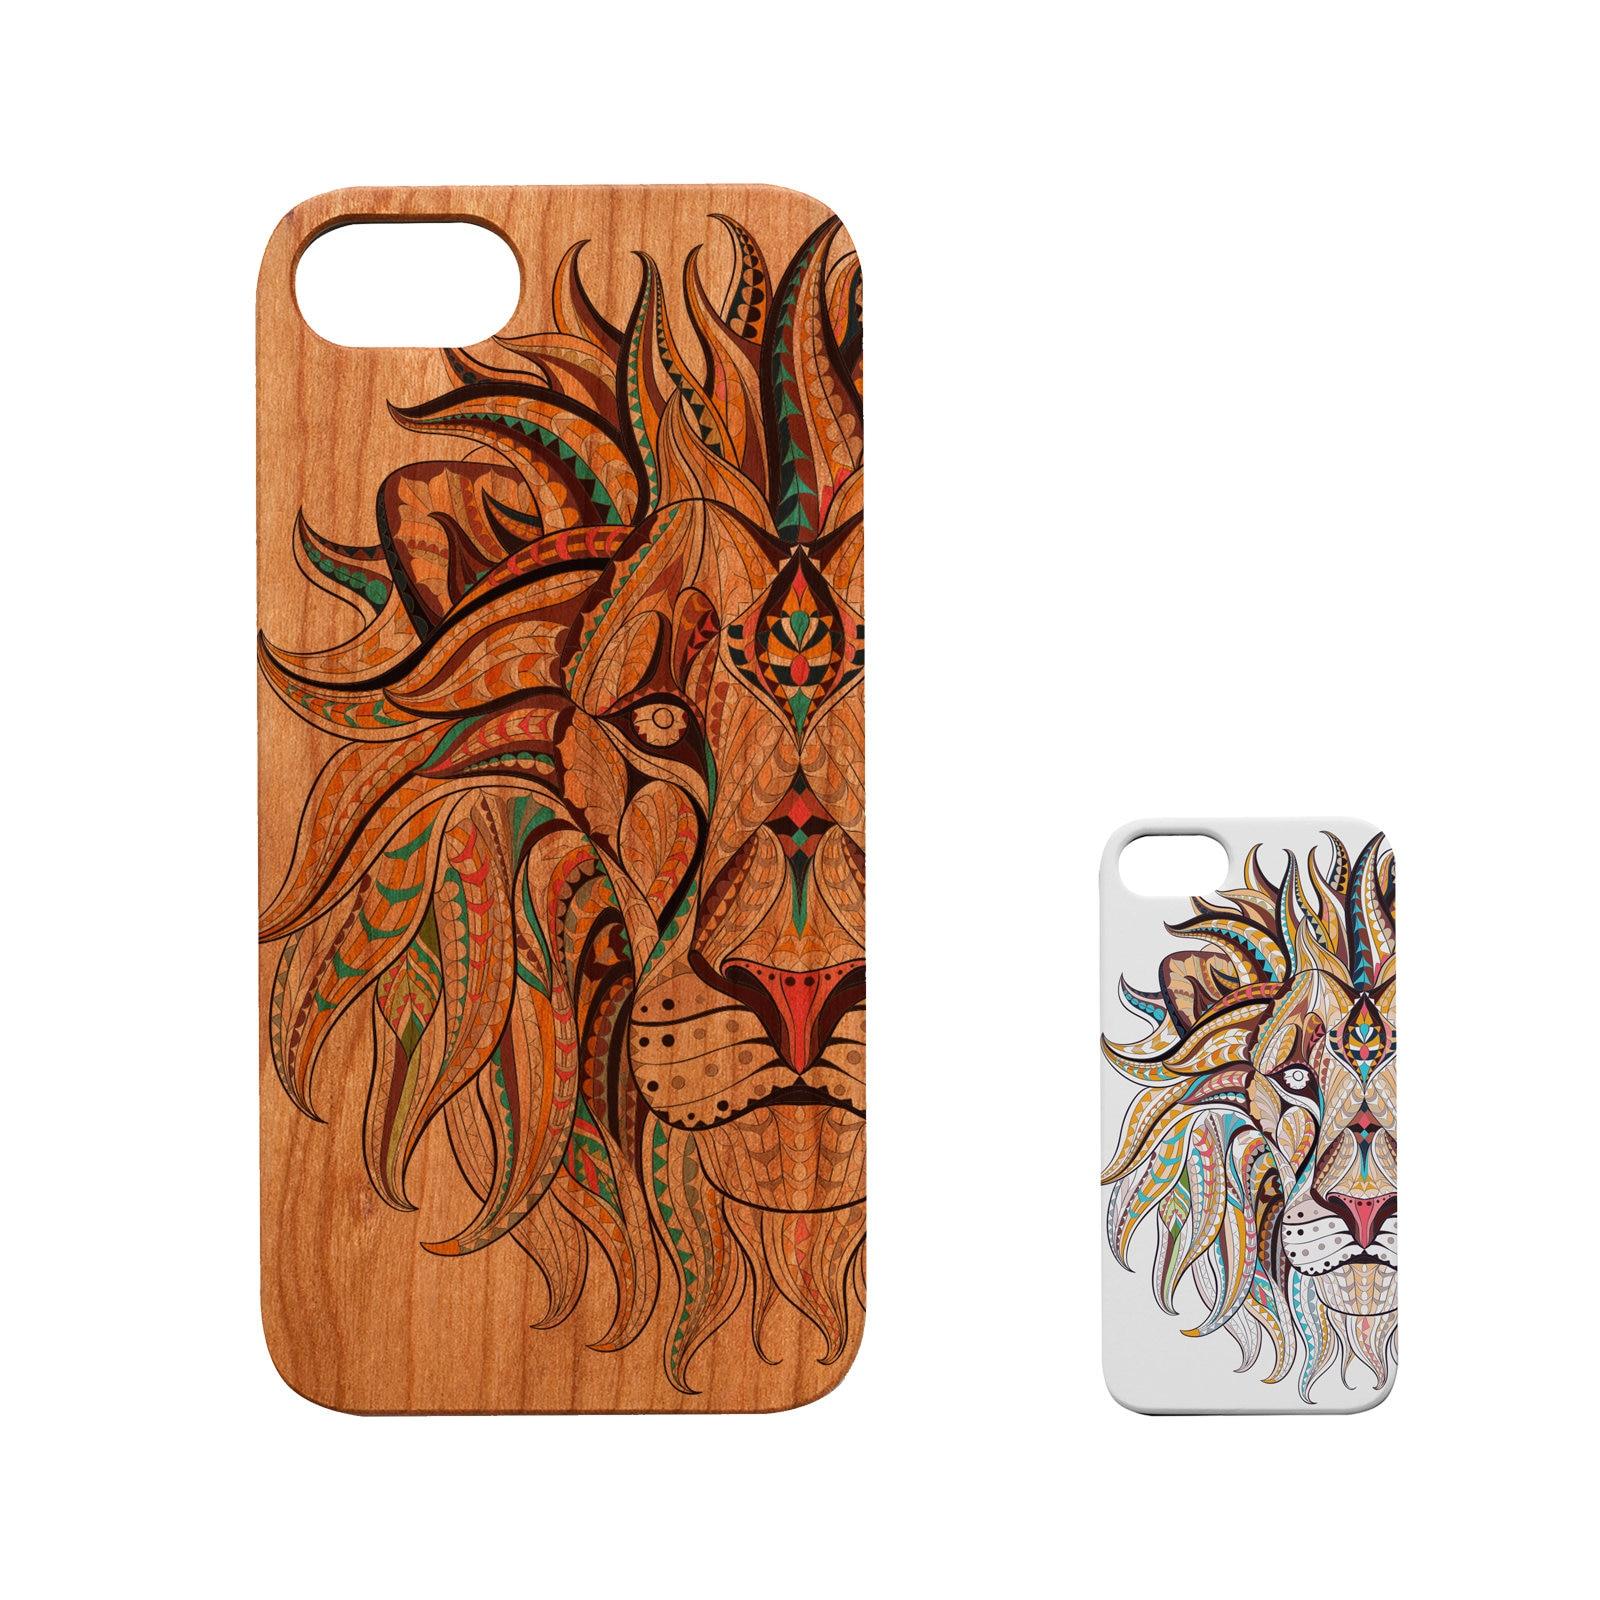 Xs 7+ FE 10+ SE Xr Lion Waves 6+,Samsung S20 Ultra 8+ LE 9 S8+ Wood Case S9+ 11 Pro Max 20 Note 8 iPhone 12 Mini X